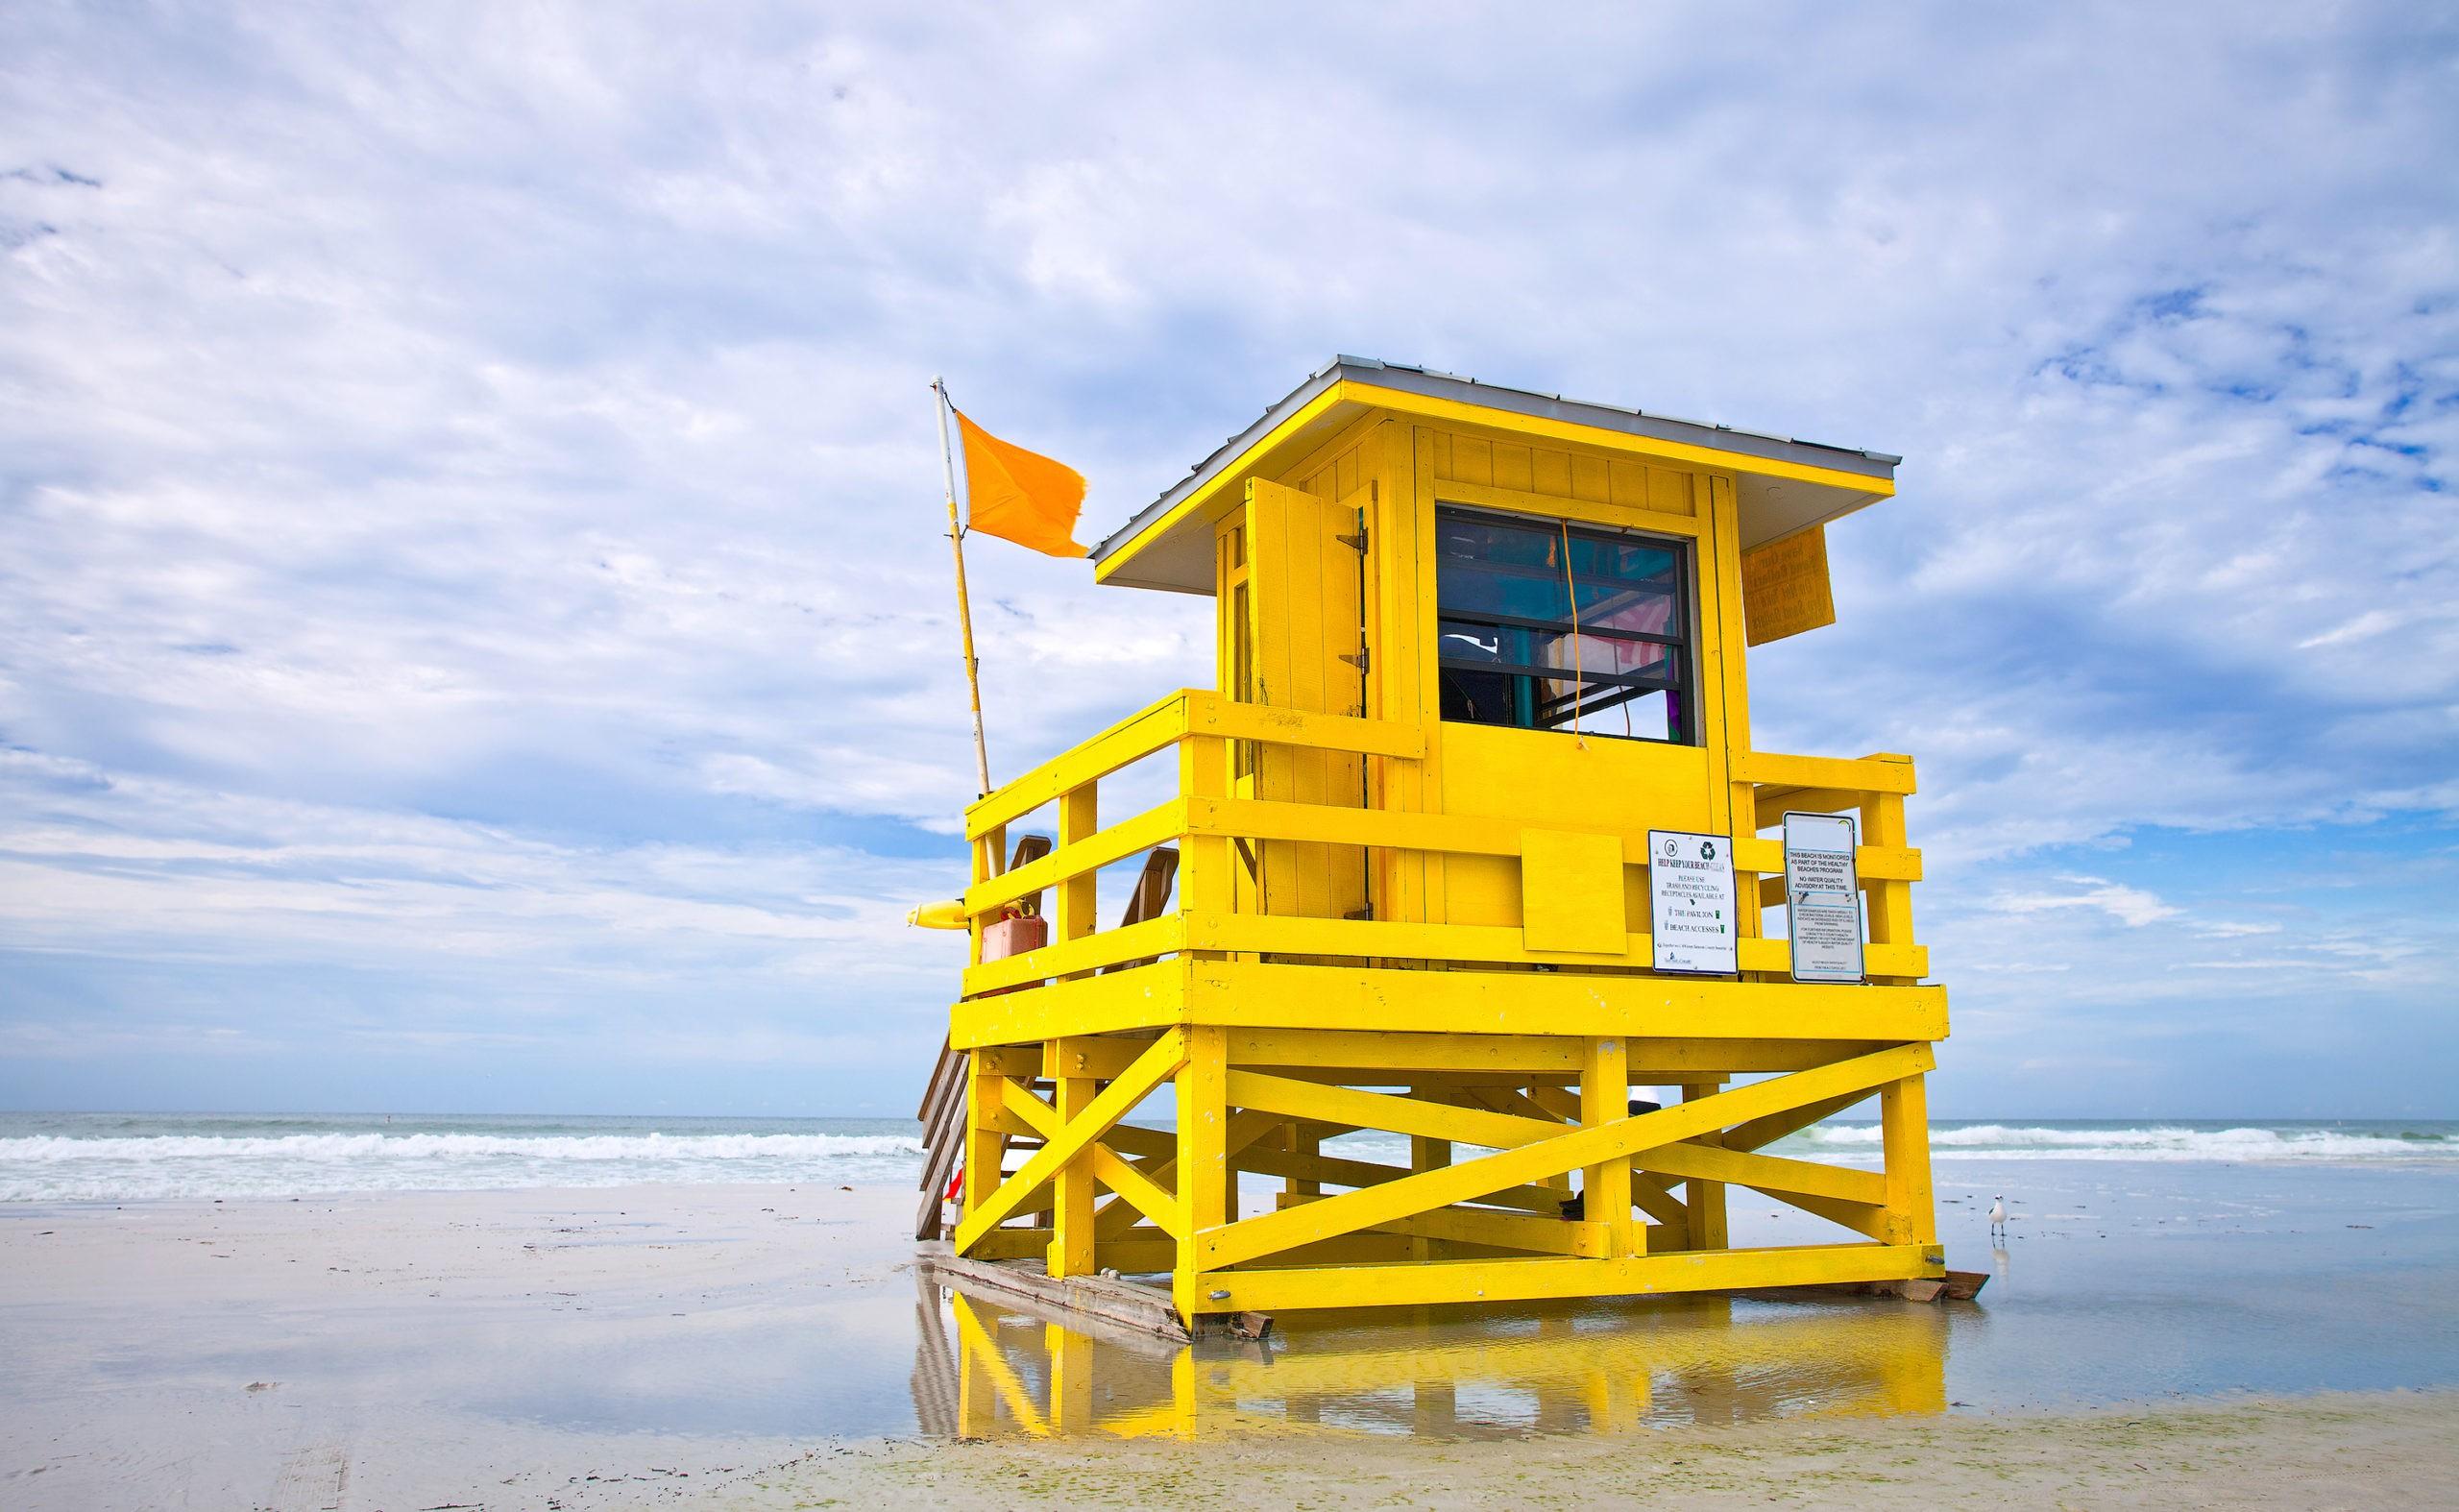 Florida beach yellow lifeguard house , Siesta Key